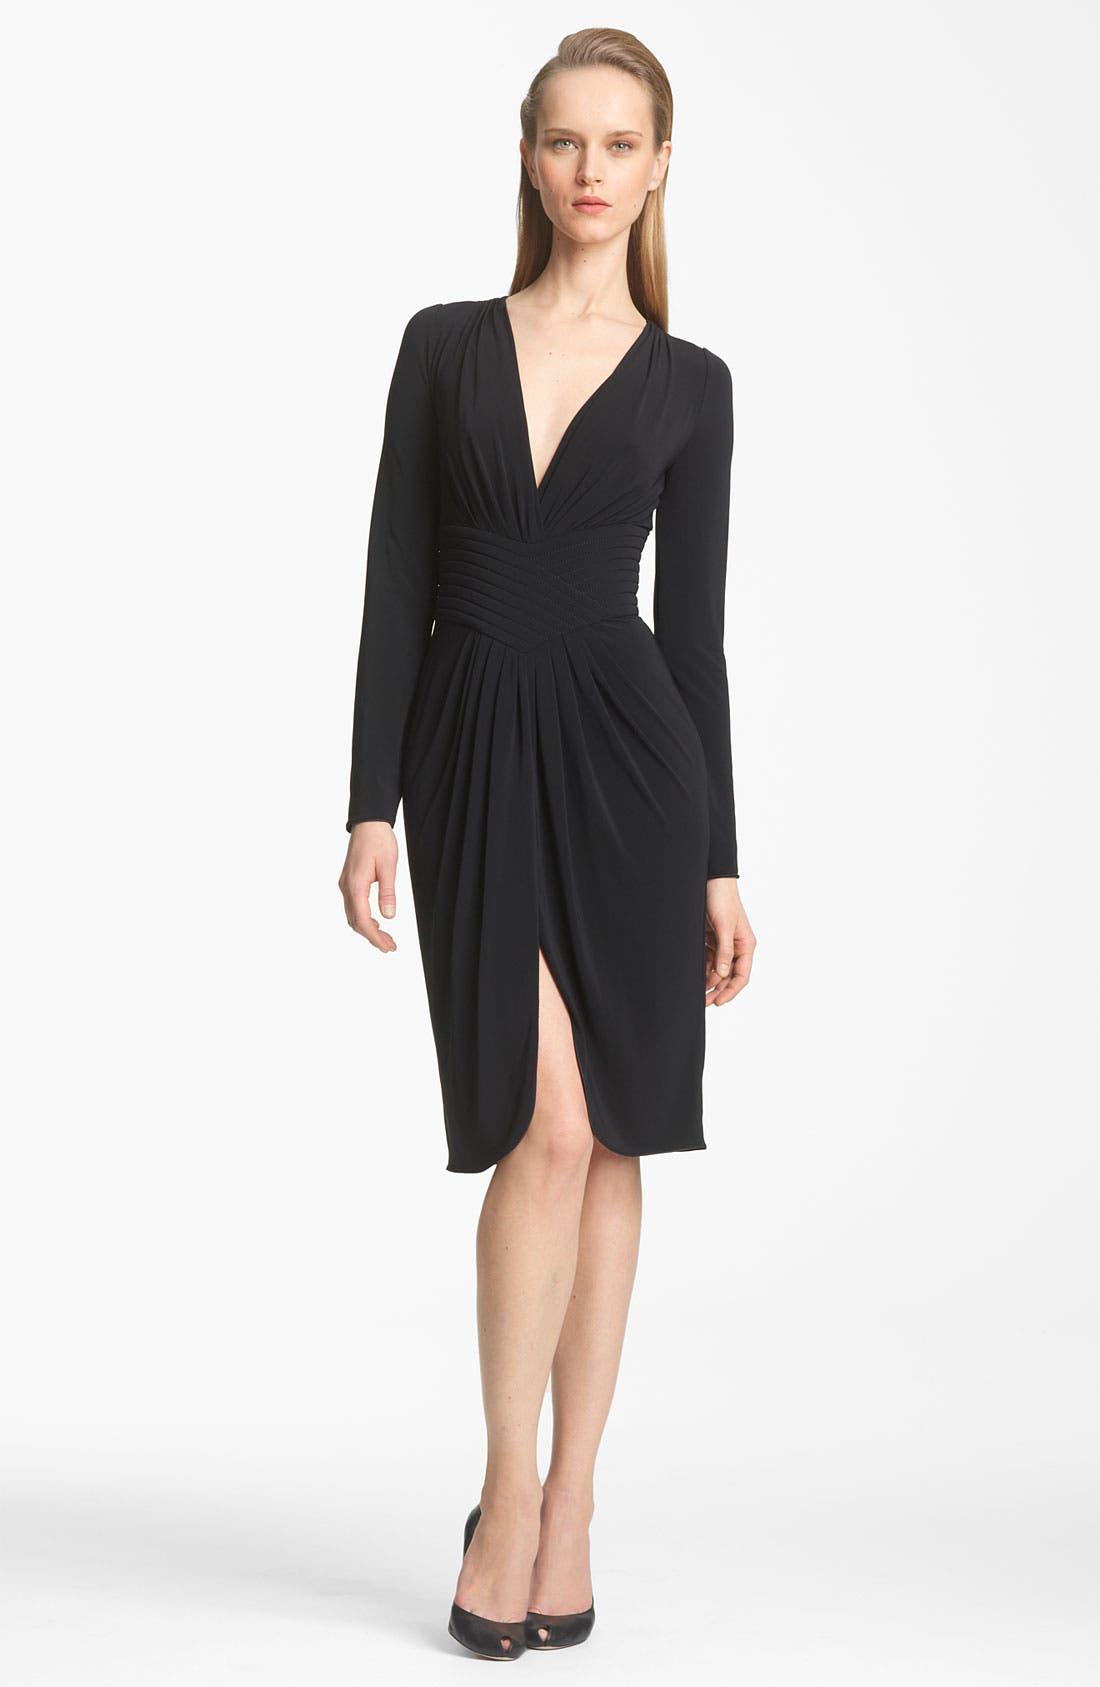 Alternate Image 1 Selected - Armani Collezioni Matte Jersey Dress